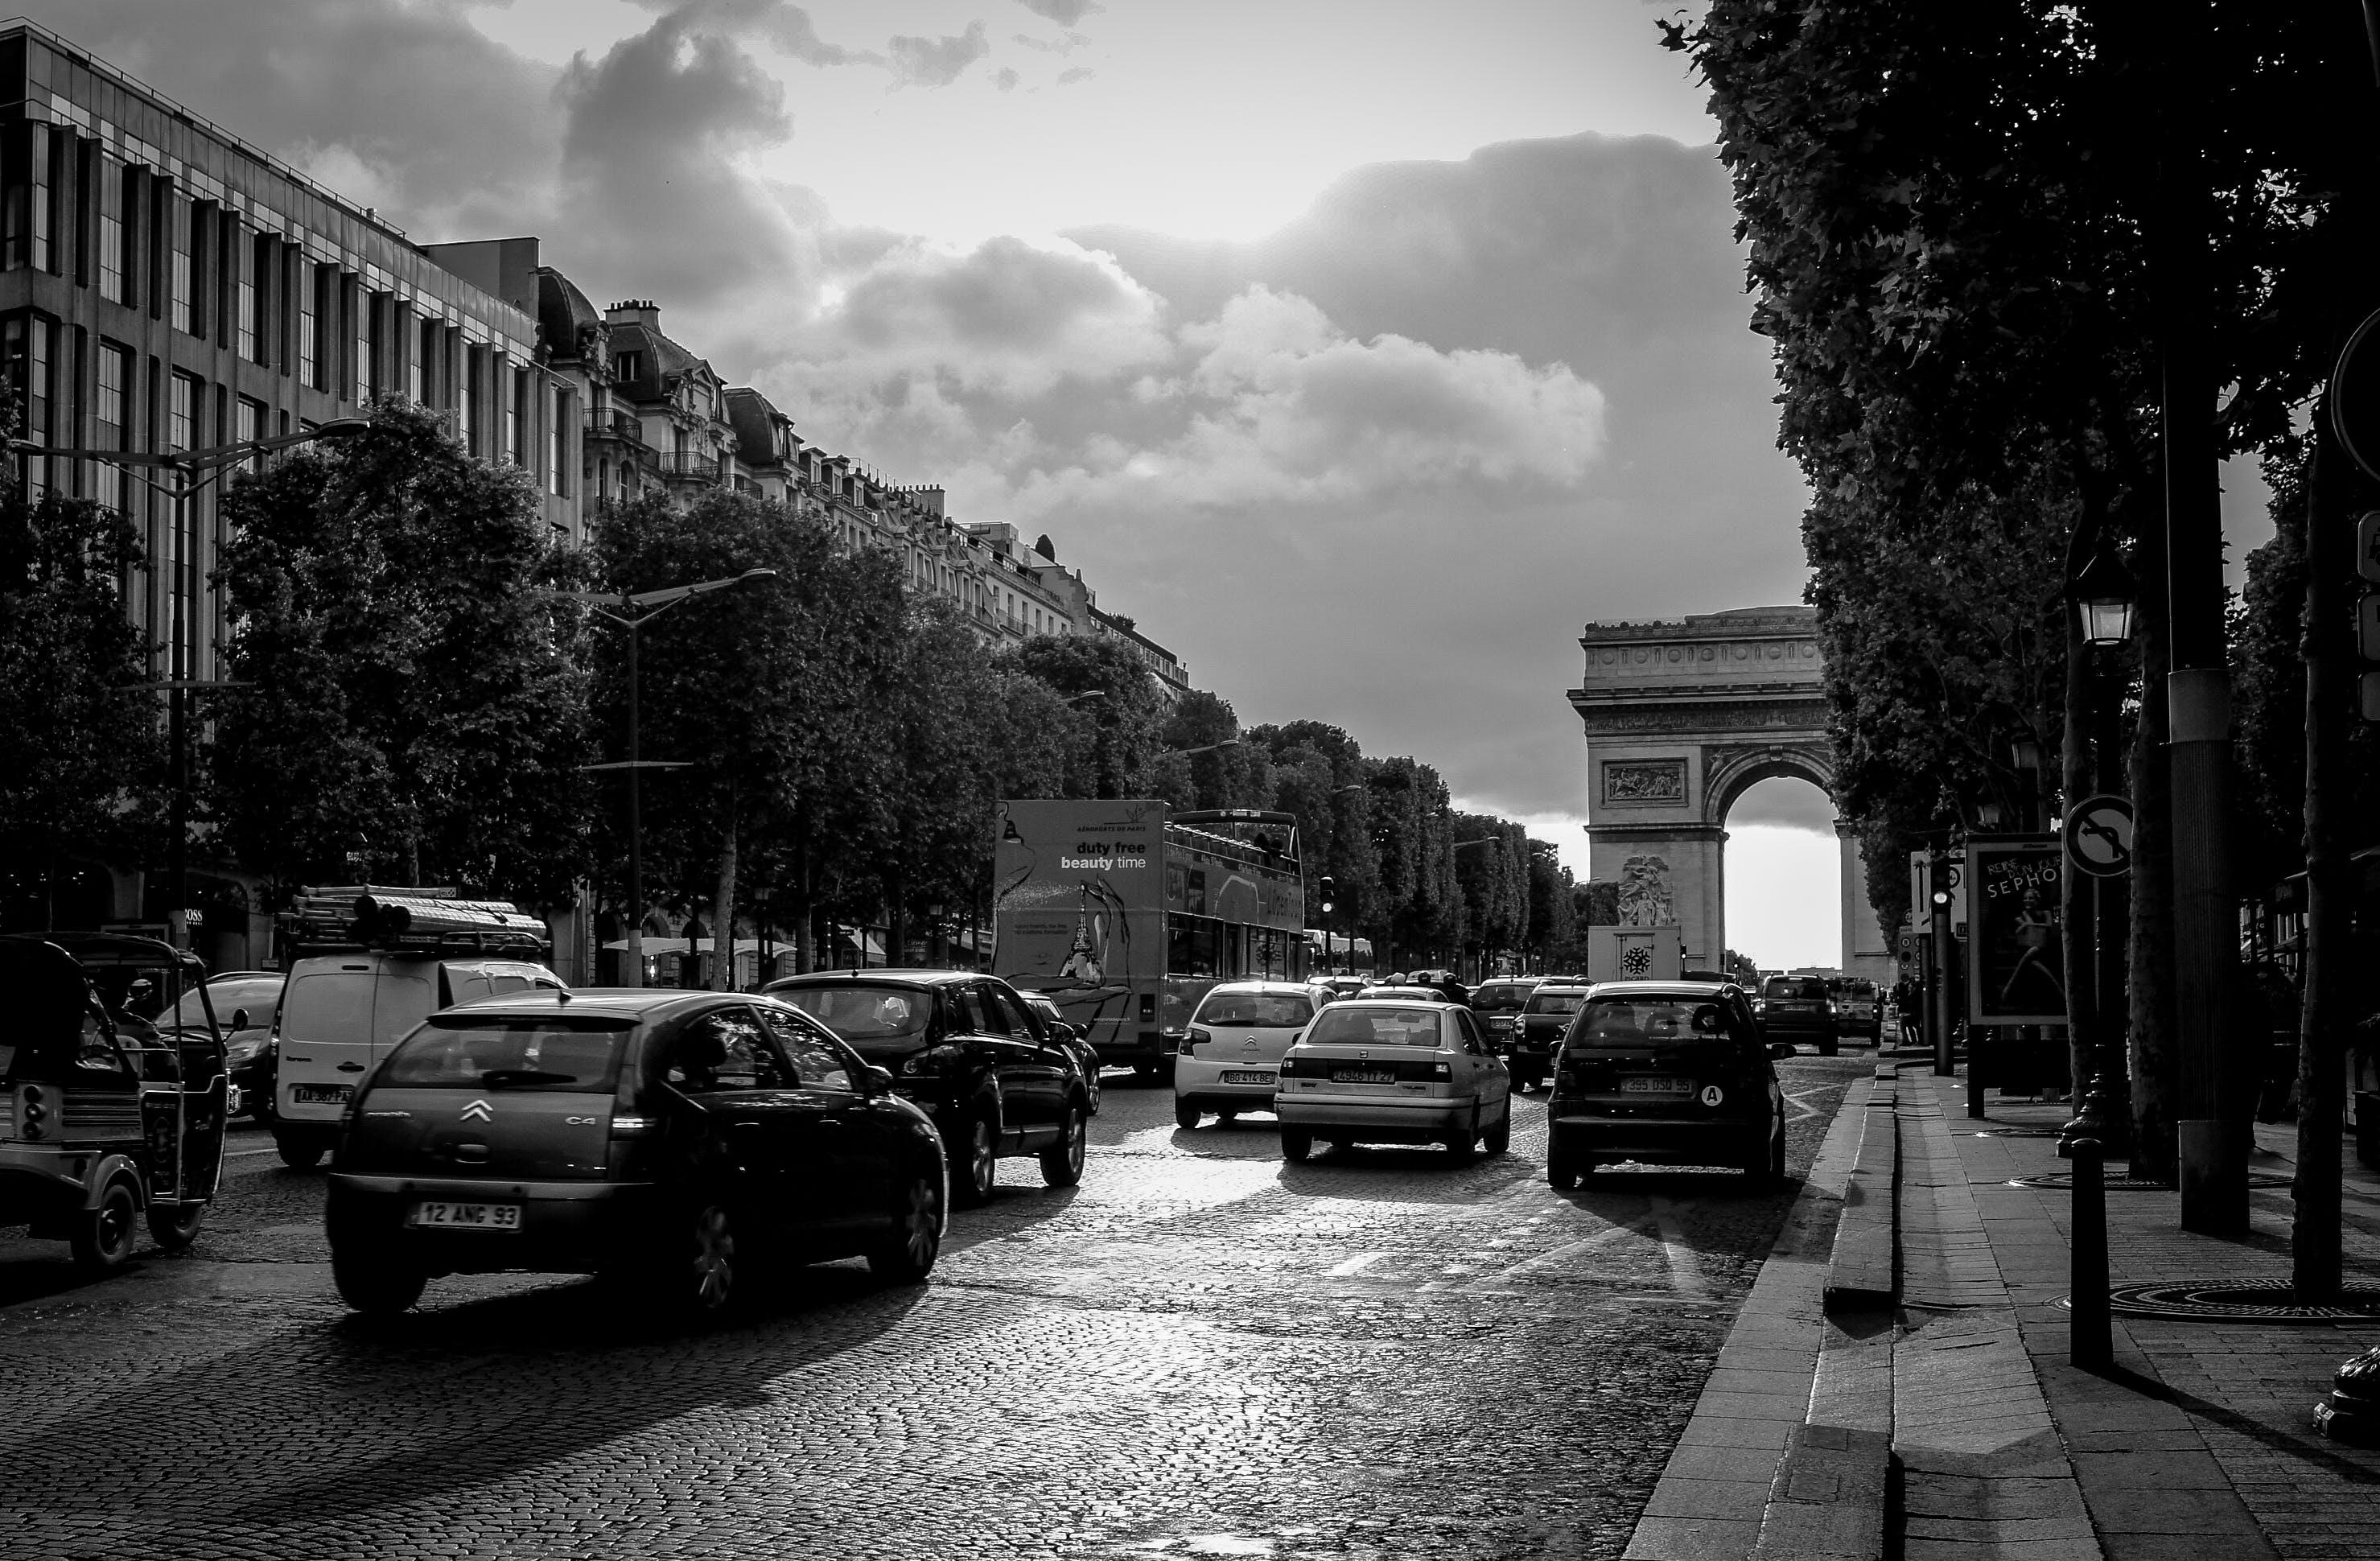 Fotos de stock gratuitas de arboles, arquitectura, automóviles, autopista